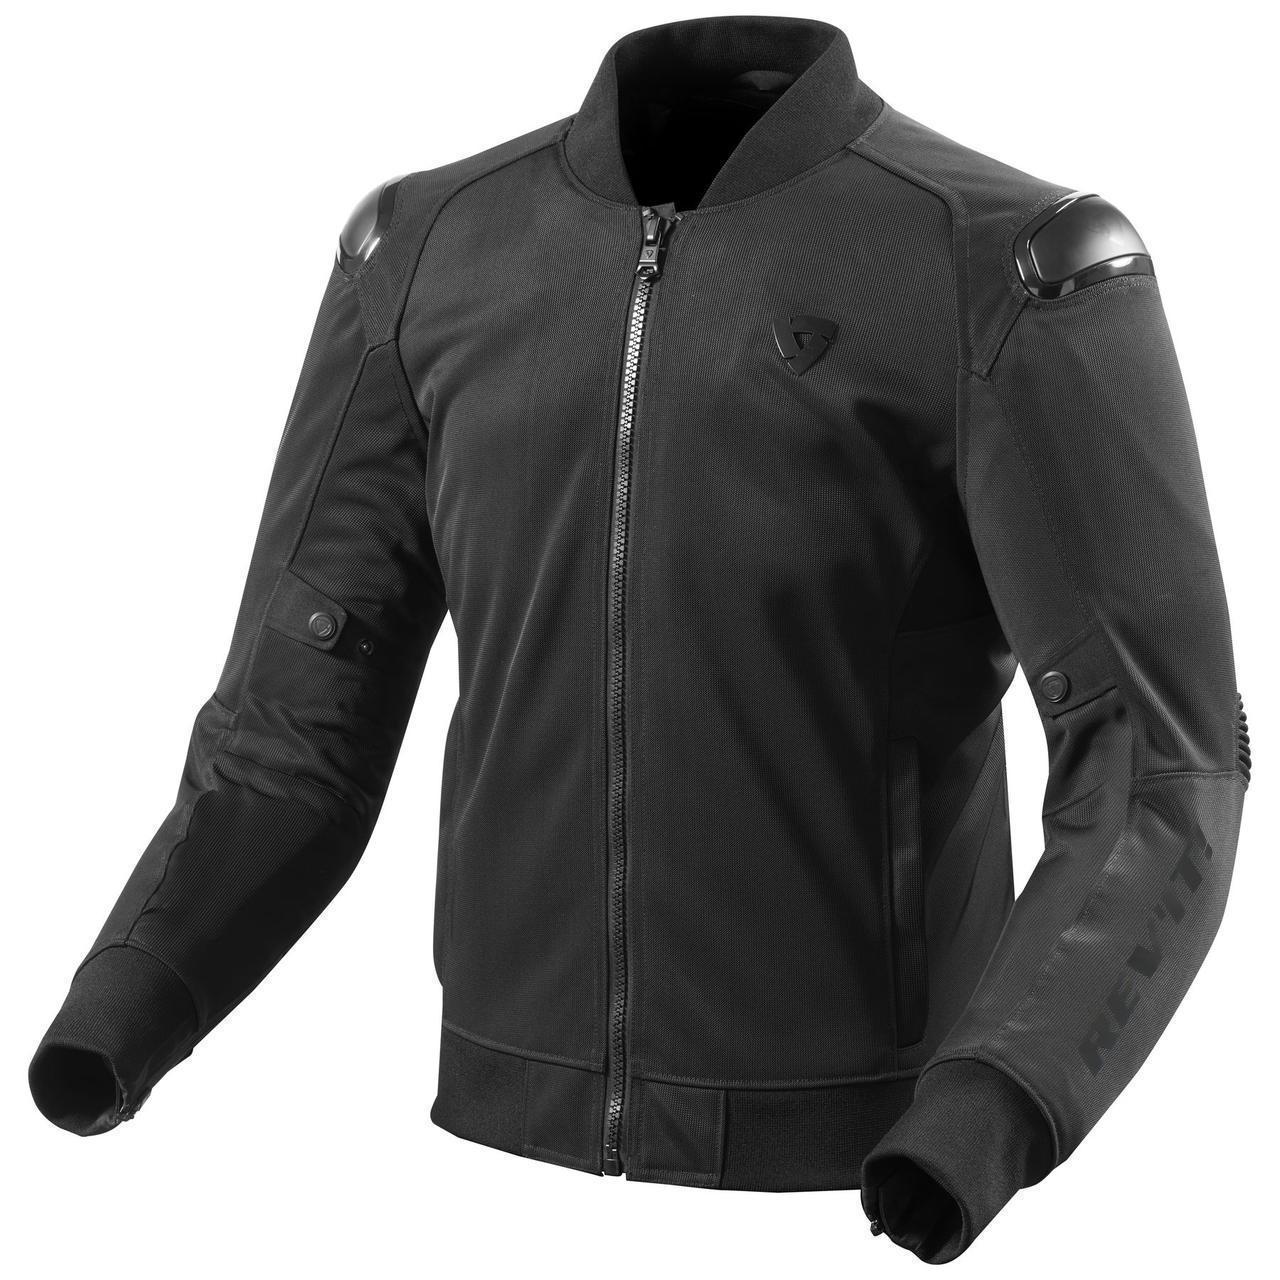 Мотокуртка Revit TRACTION текстиль р. 3XL black